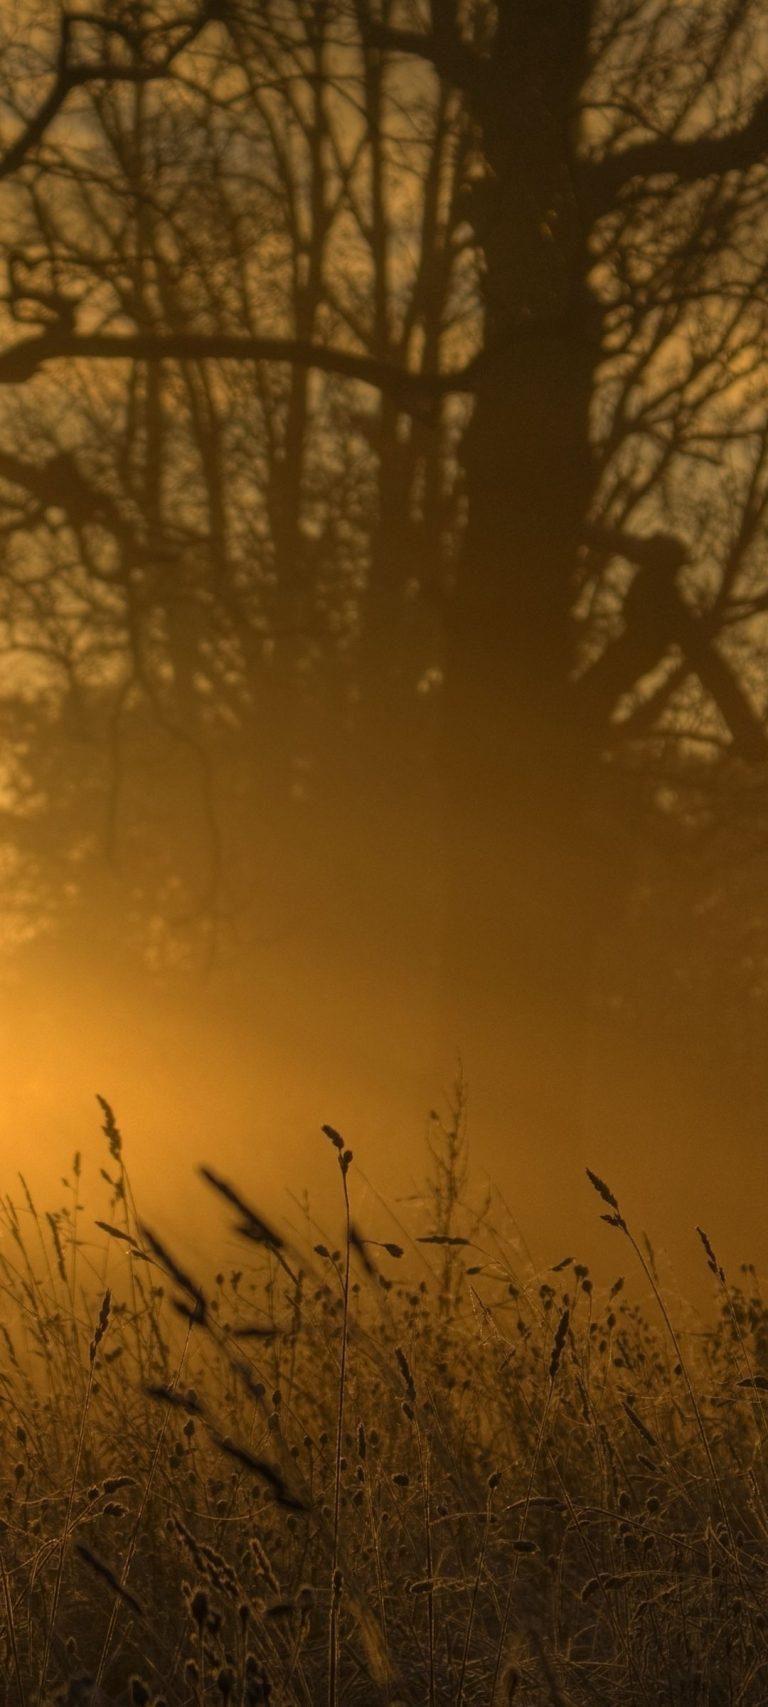 Light Sun Ears Outlines Trees 1080x2400 768x1707